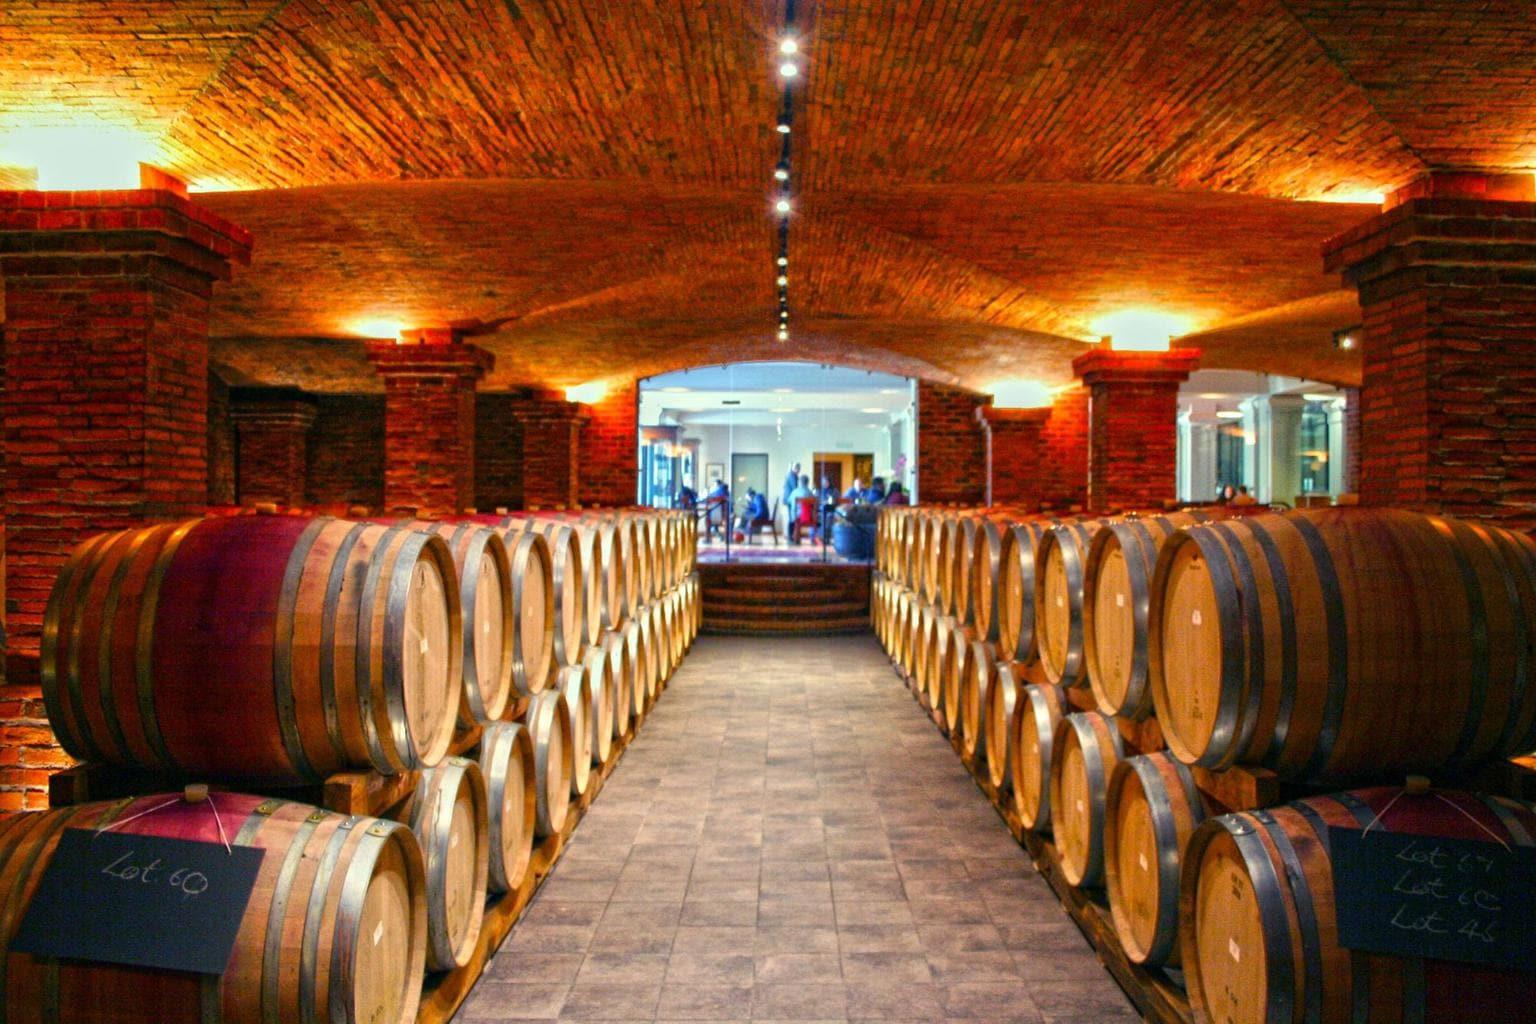 The cellar at La Motte